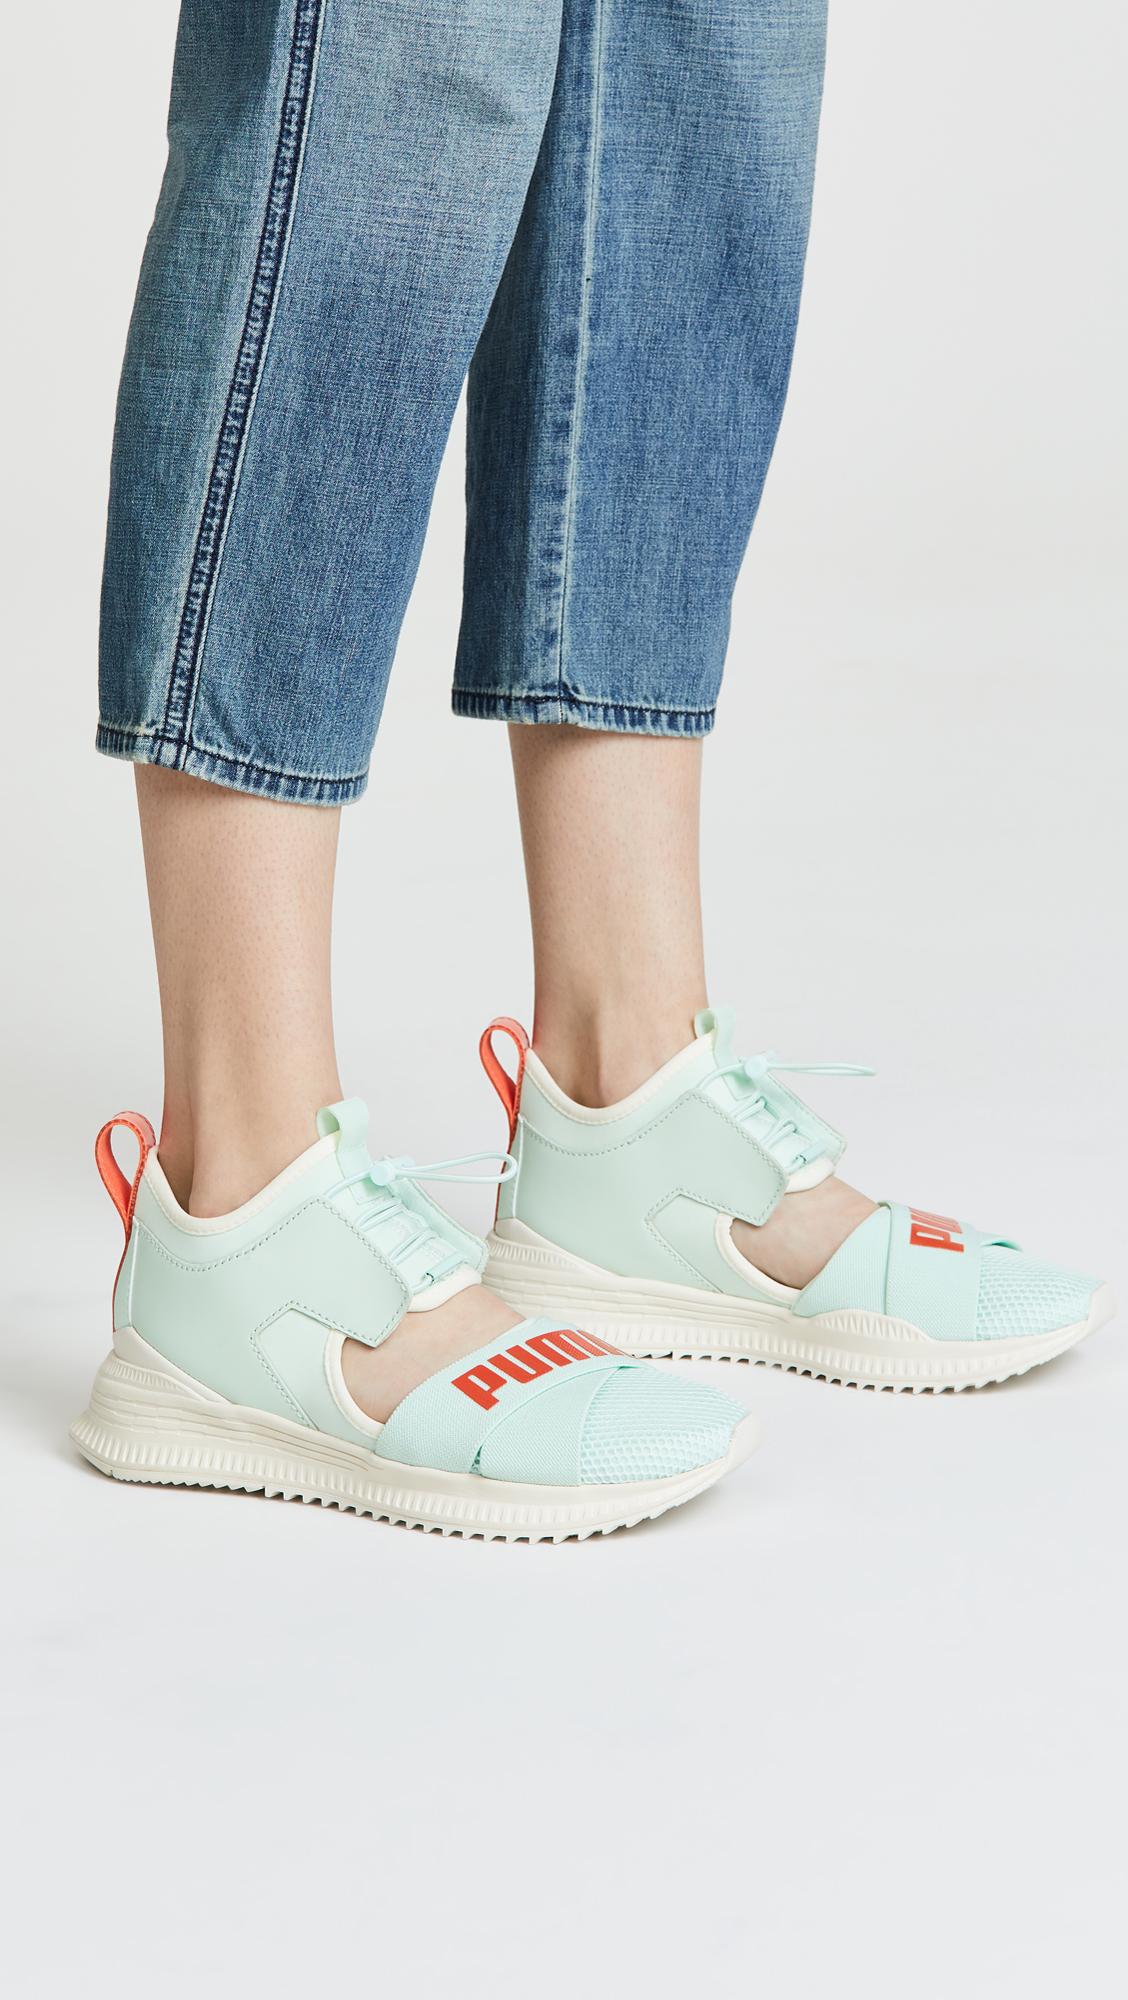 PUMA FENTY x PUMA Avid Sneakers  302a239a6